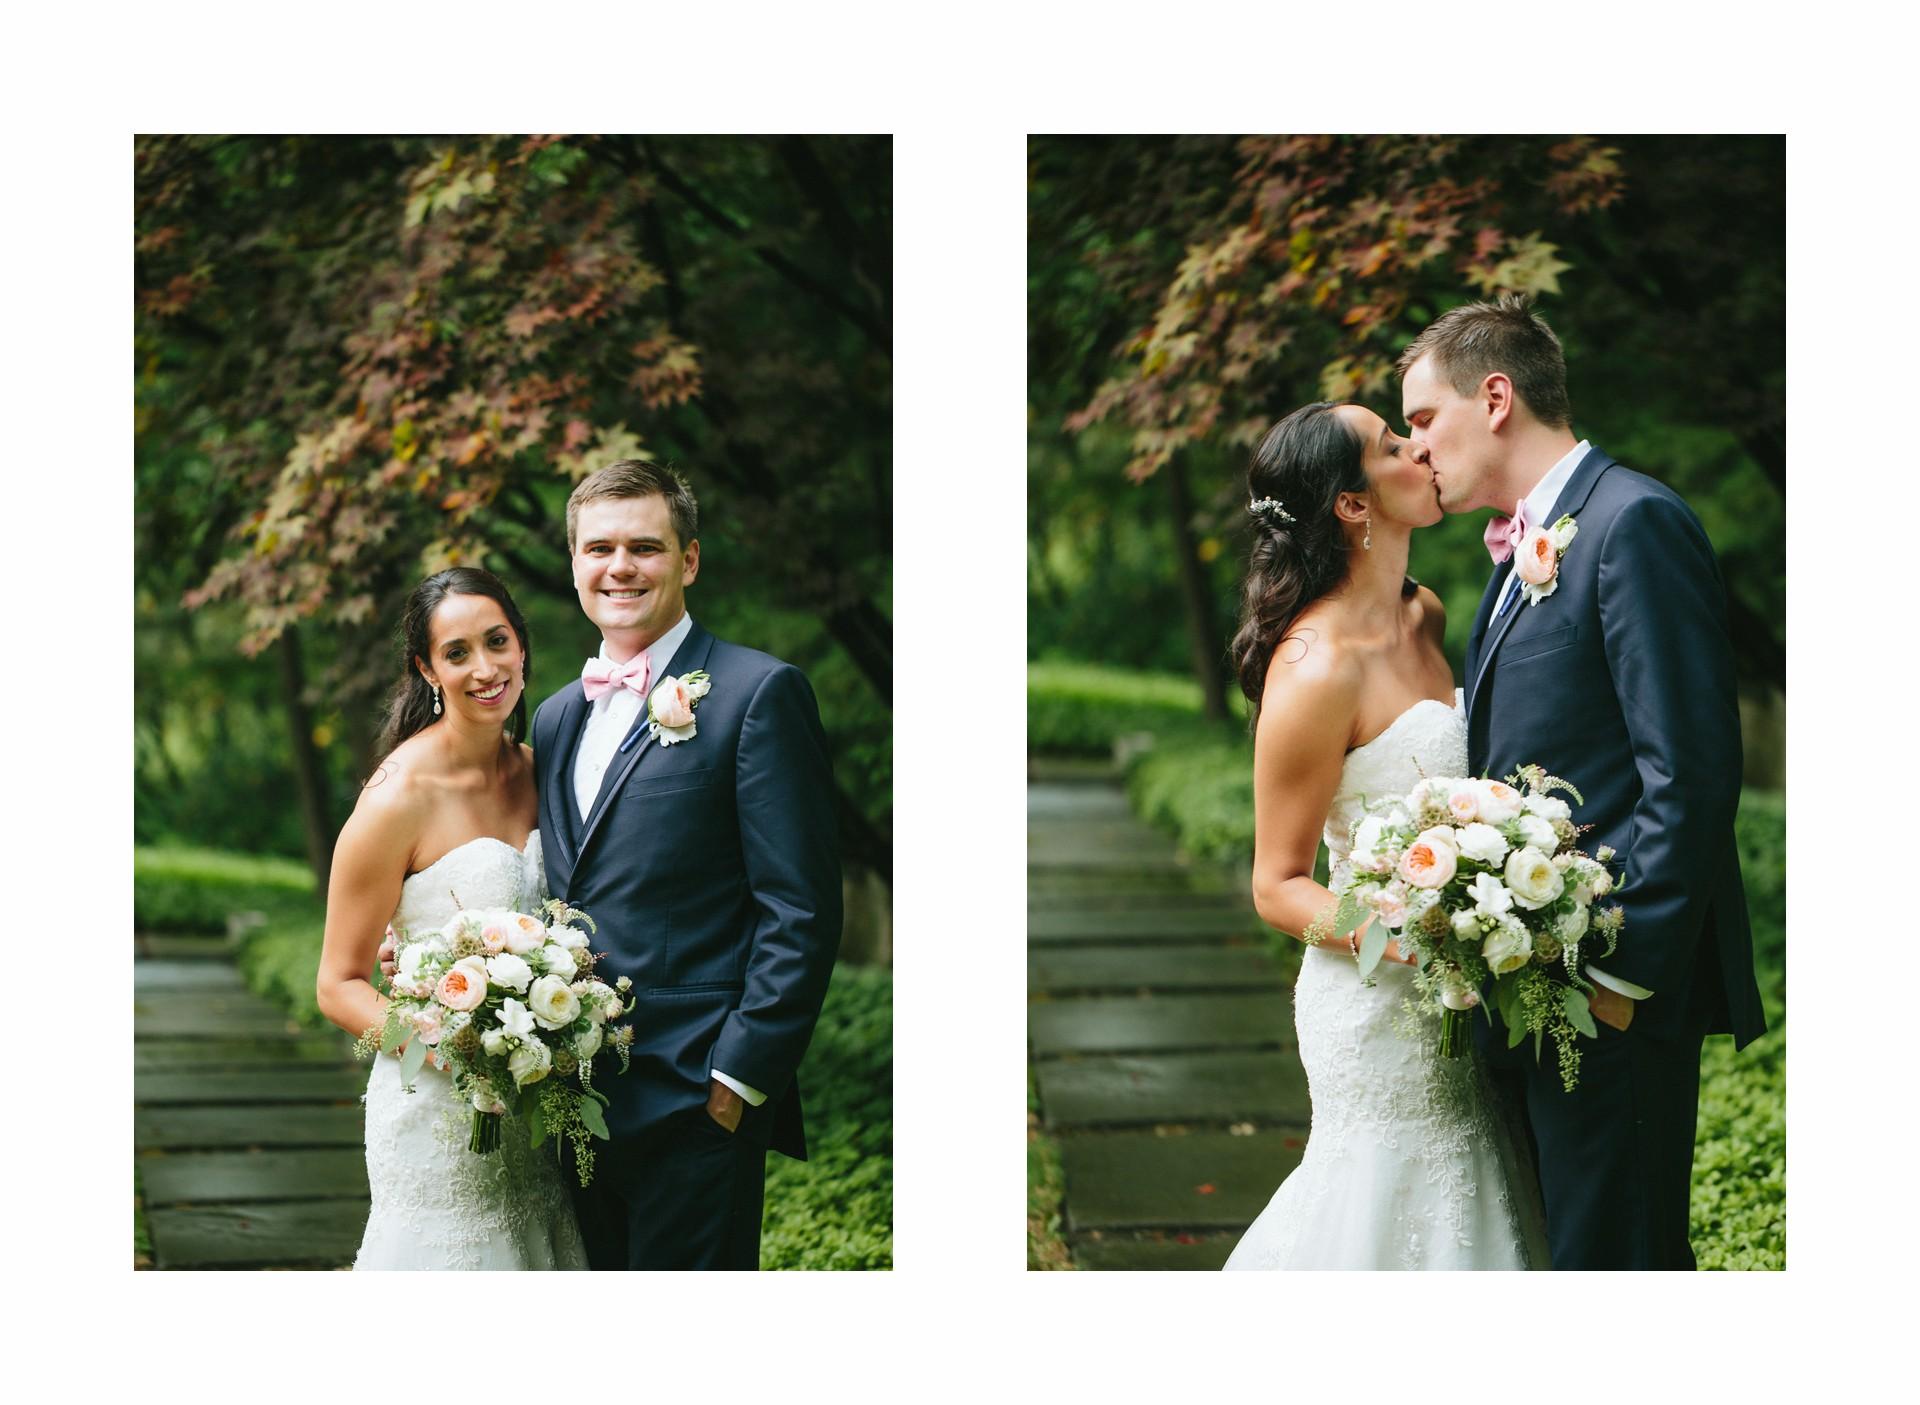 Bolton House Wedding Photographer in Beachwood 67.jpg